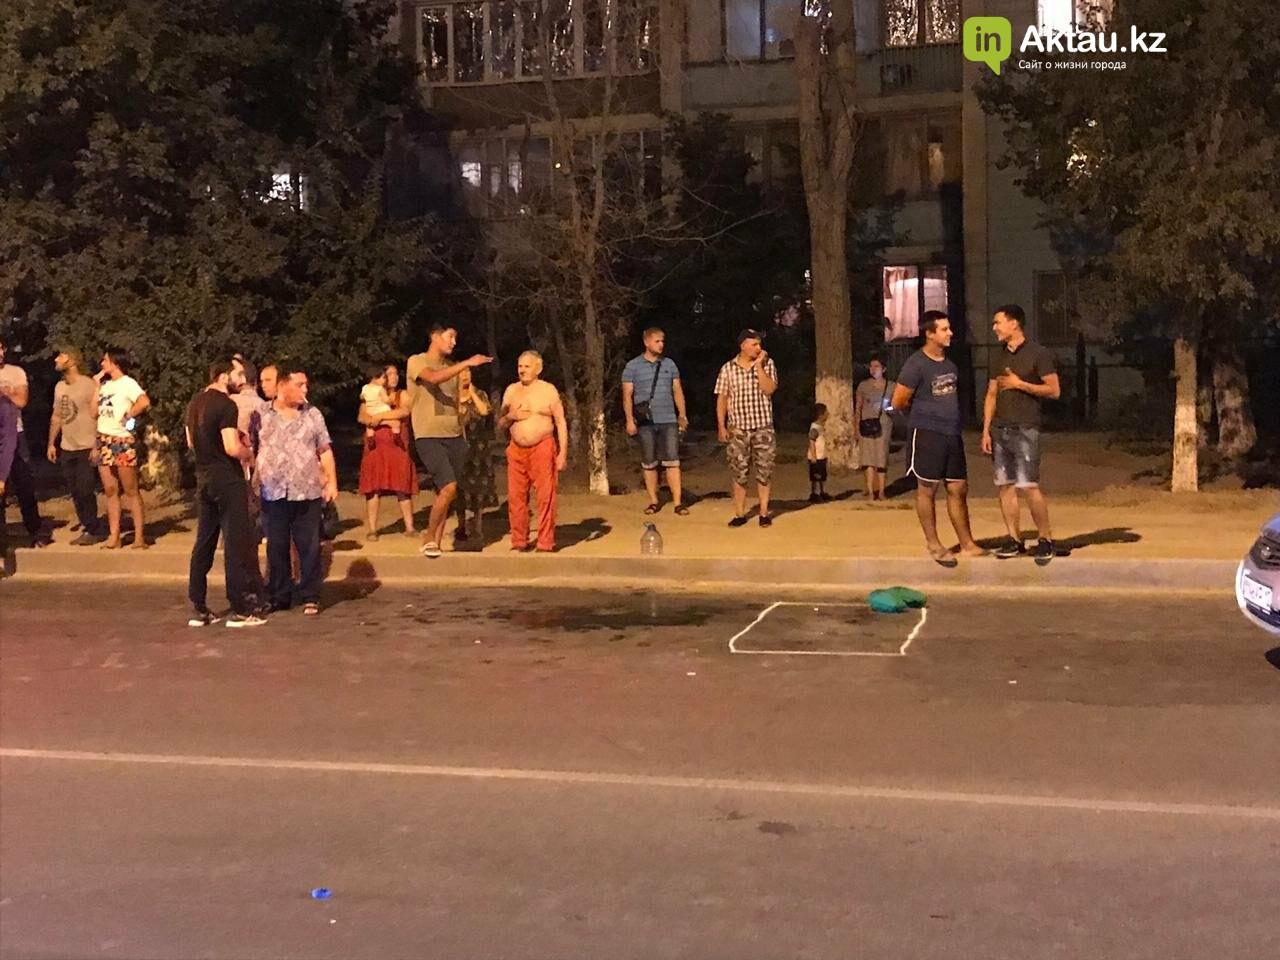 Мотоциклист пострадал в аварии в Актау (ВИДЕО), фото-6